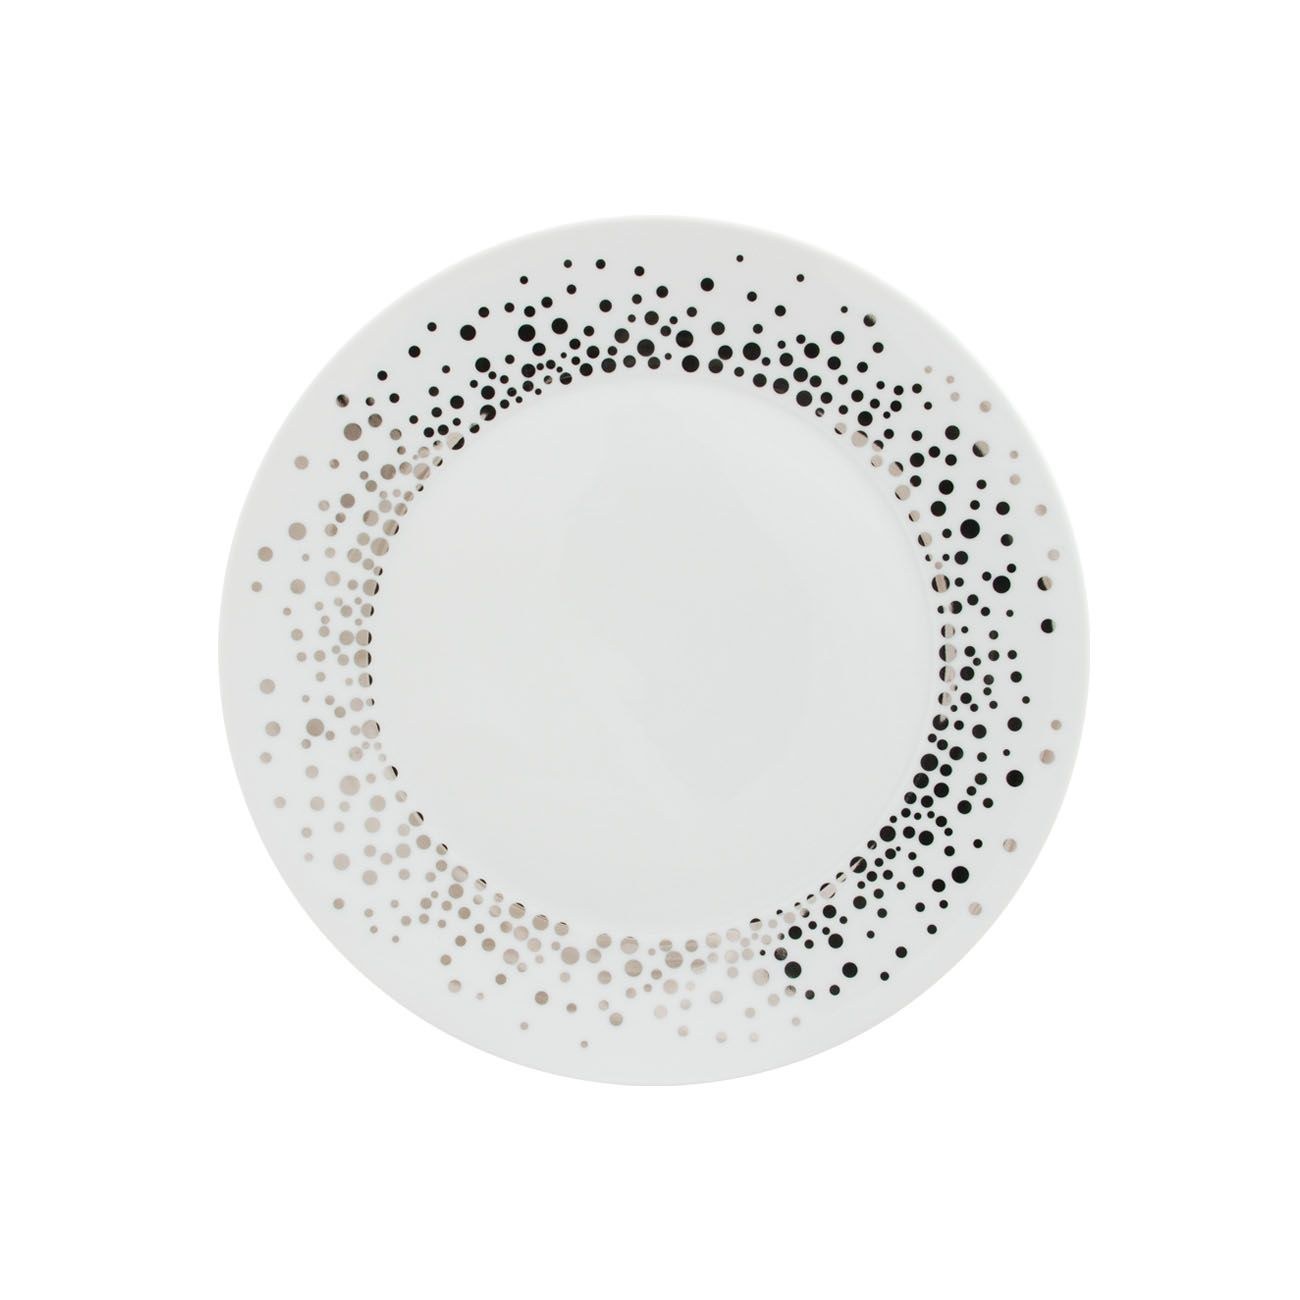 Silver Rain dinner plate by Porcel | we ♥ porcelain | Pinterest ...